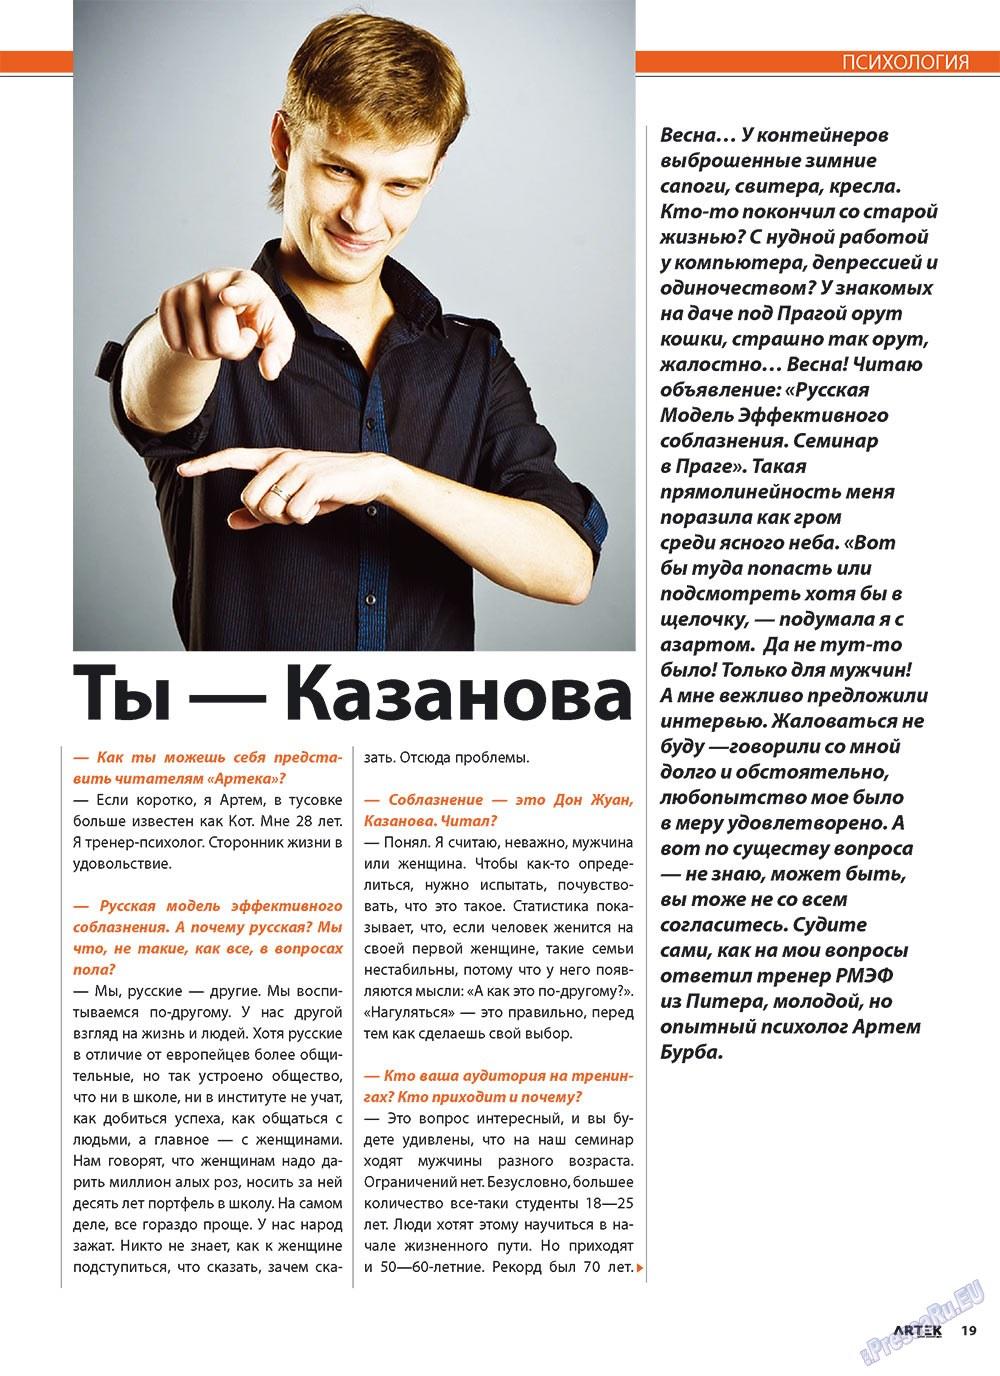 Артек (журнал). 2010 год, номер 2, стр. 21